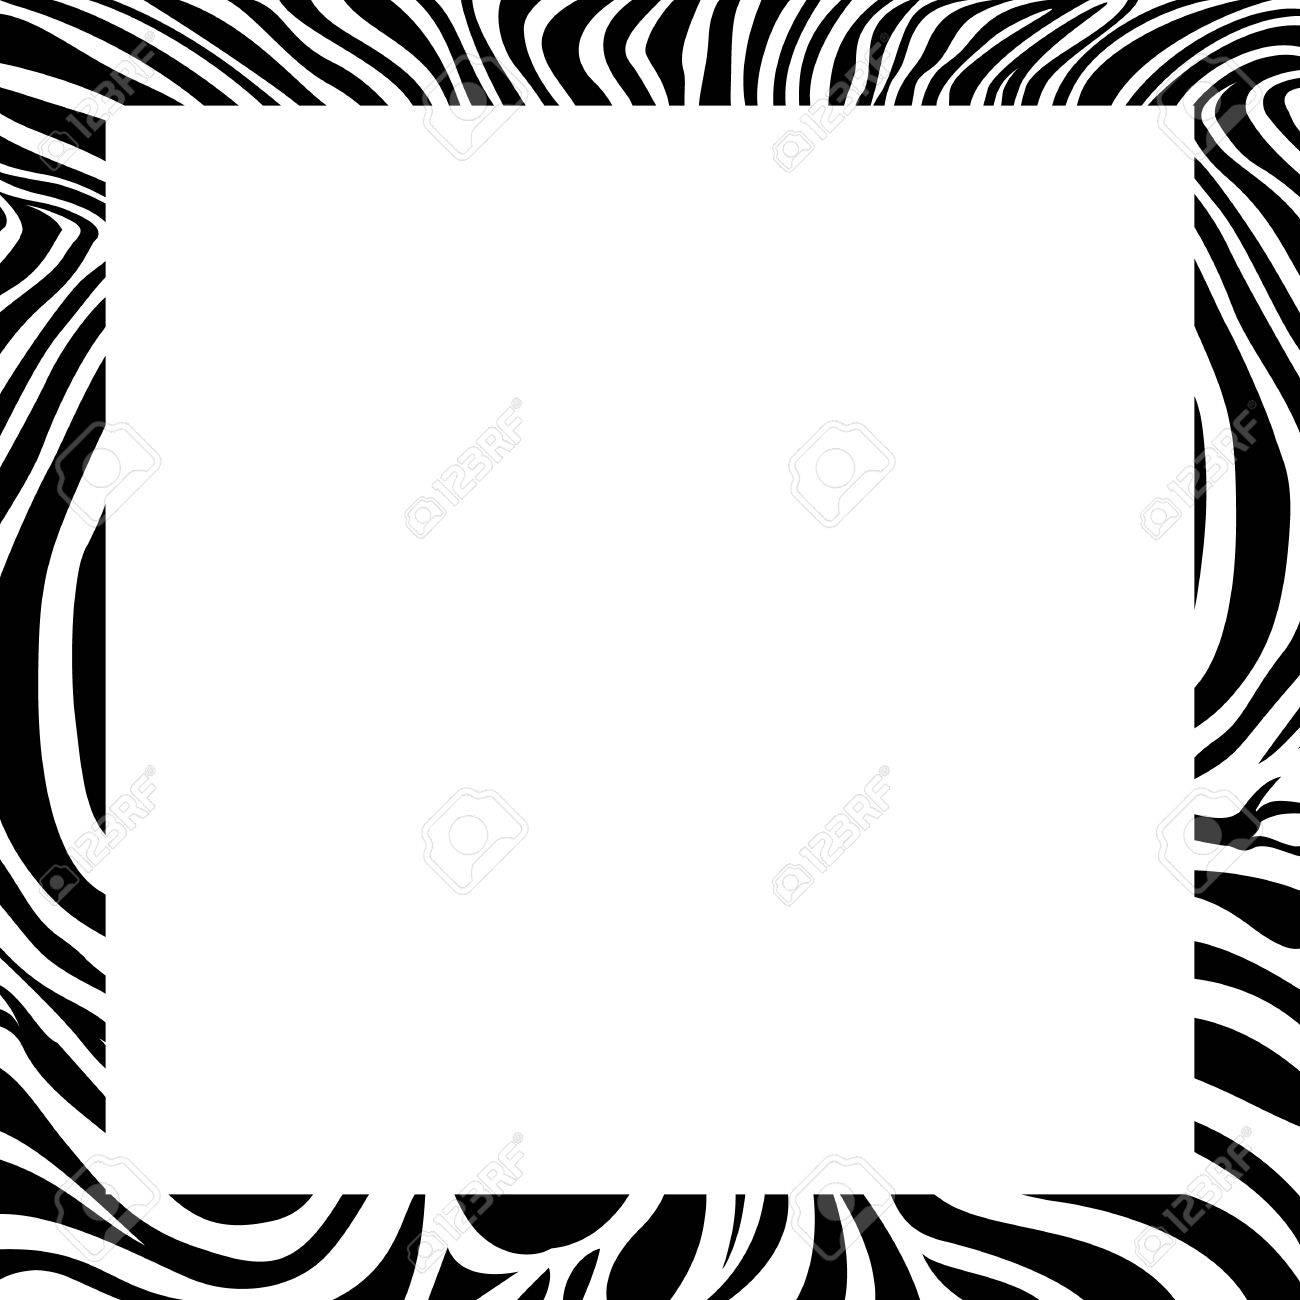 zebra print border, frame design. Animal skin texture. Vector...